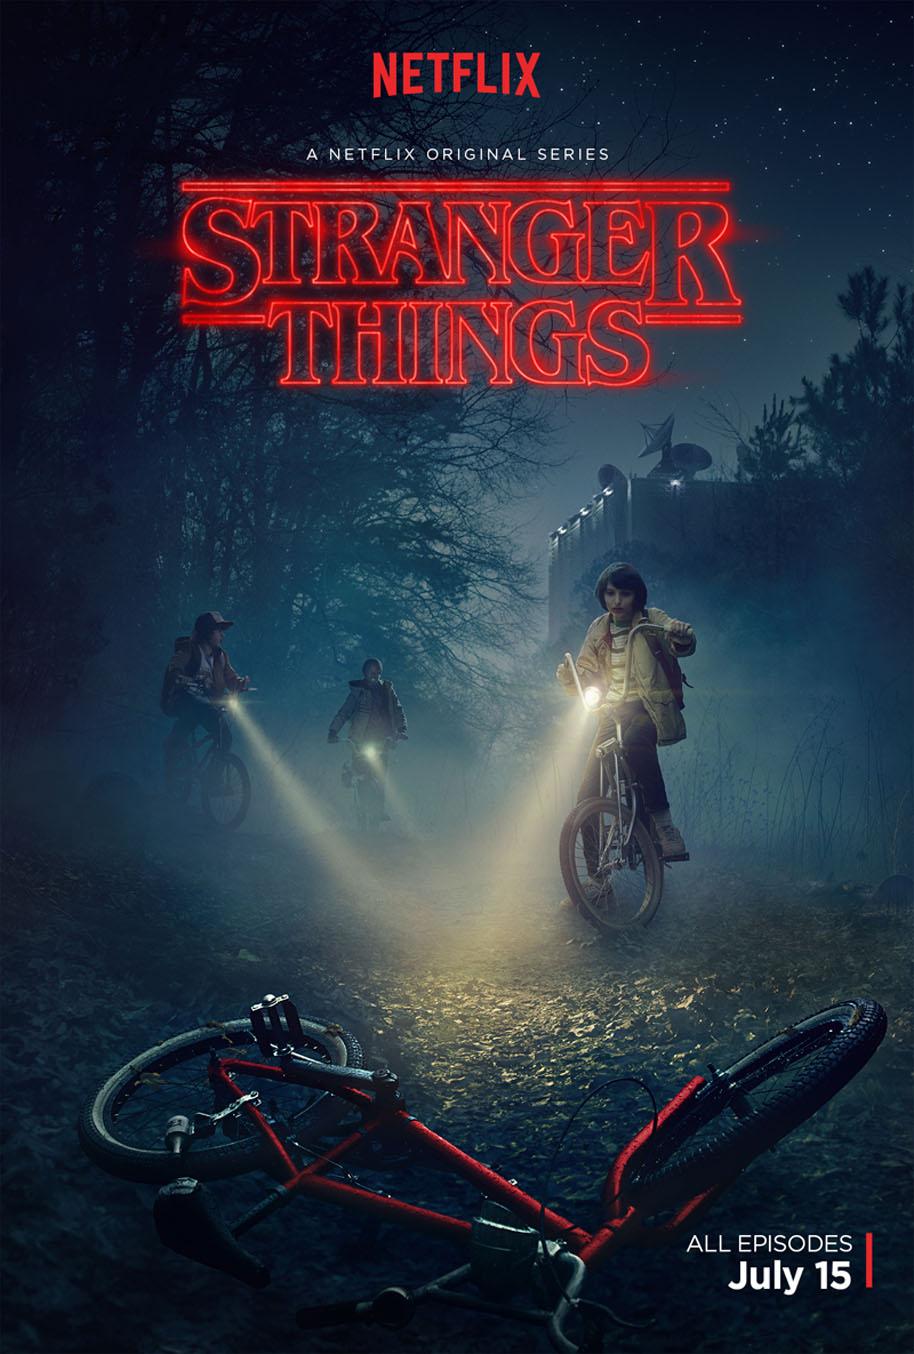 Stranger Things review: More than a glorious nostalgia trip?